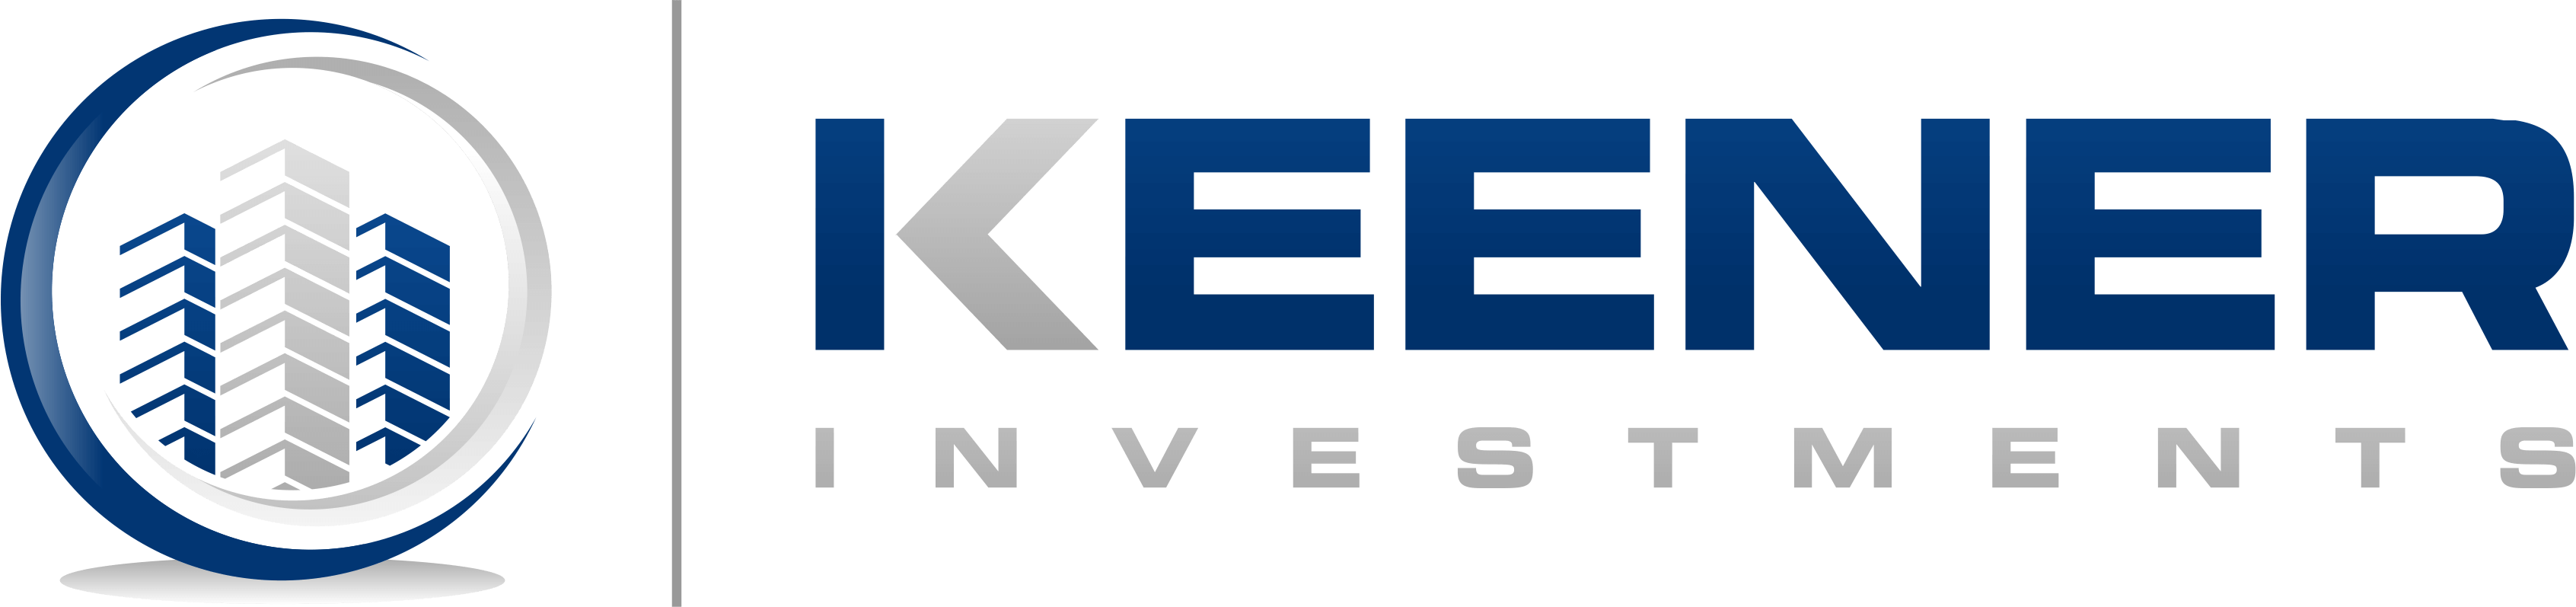 Keener Investment